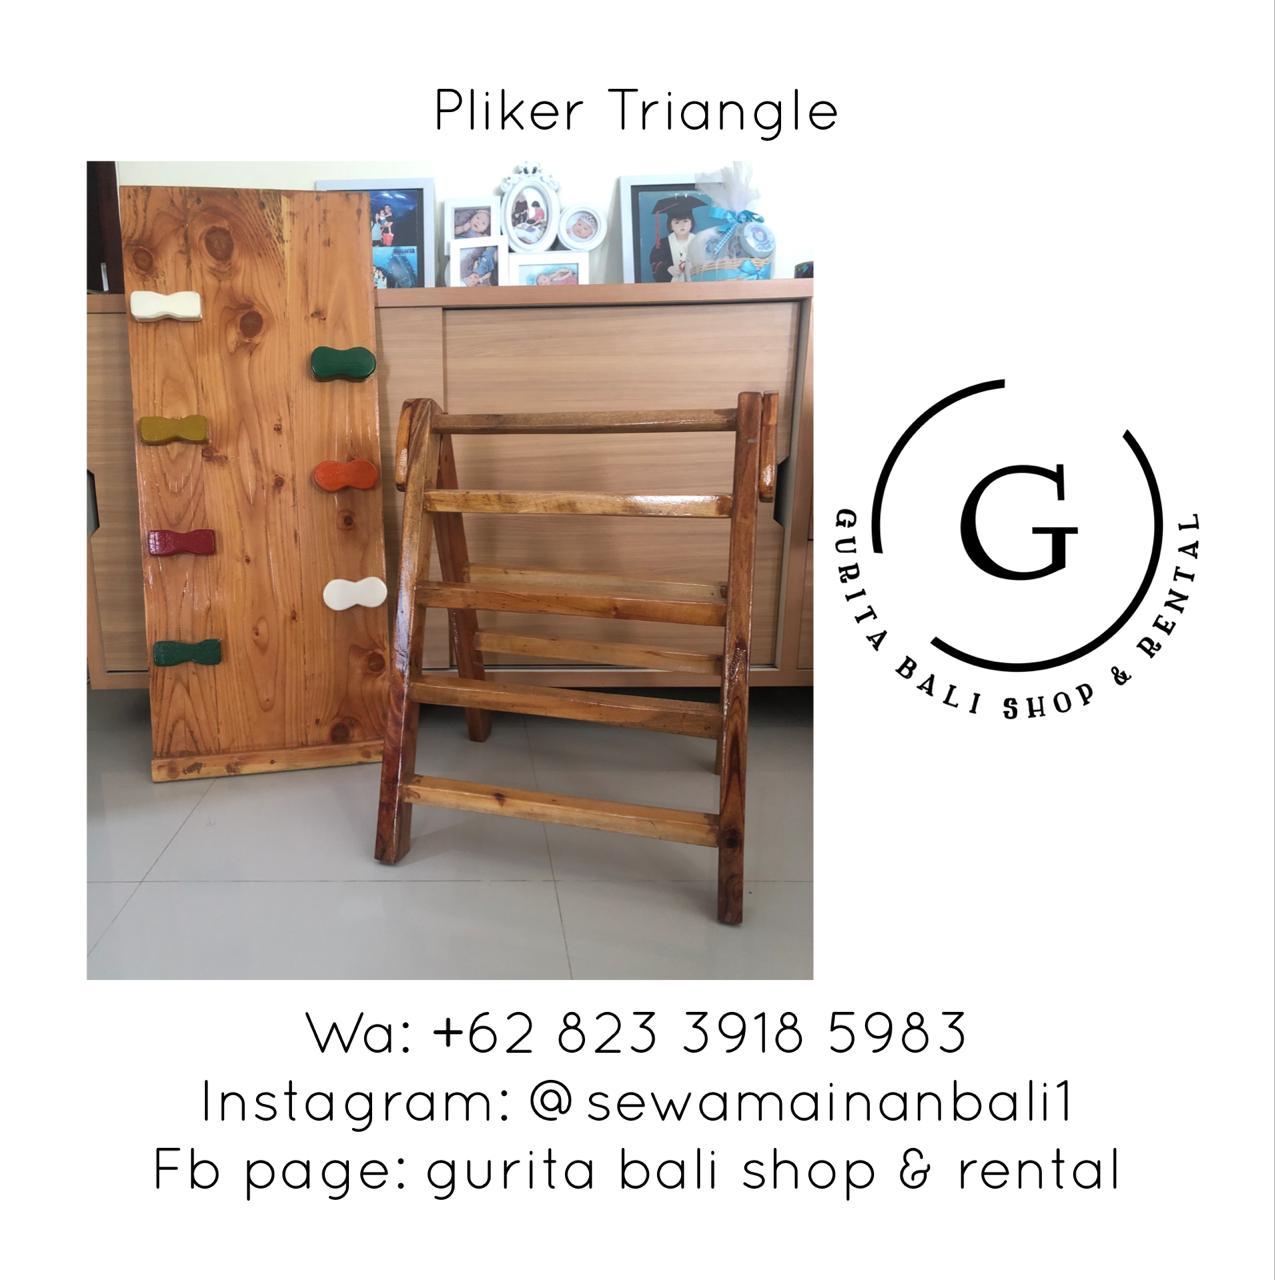 PLIKER TRIANGLE (1)